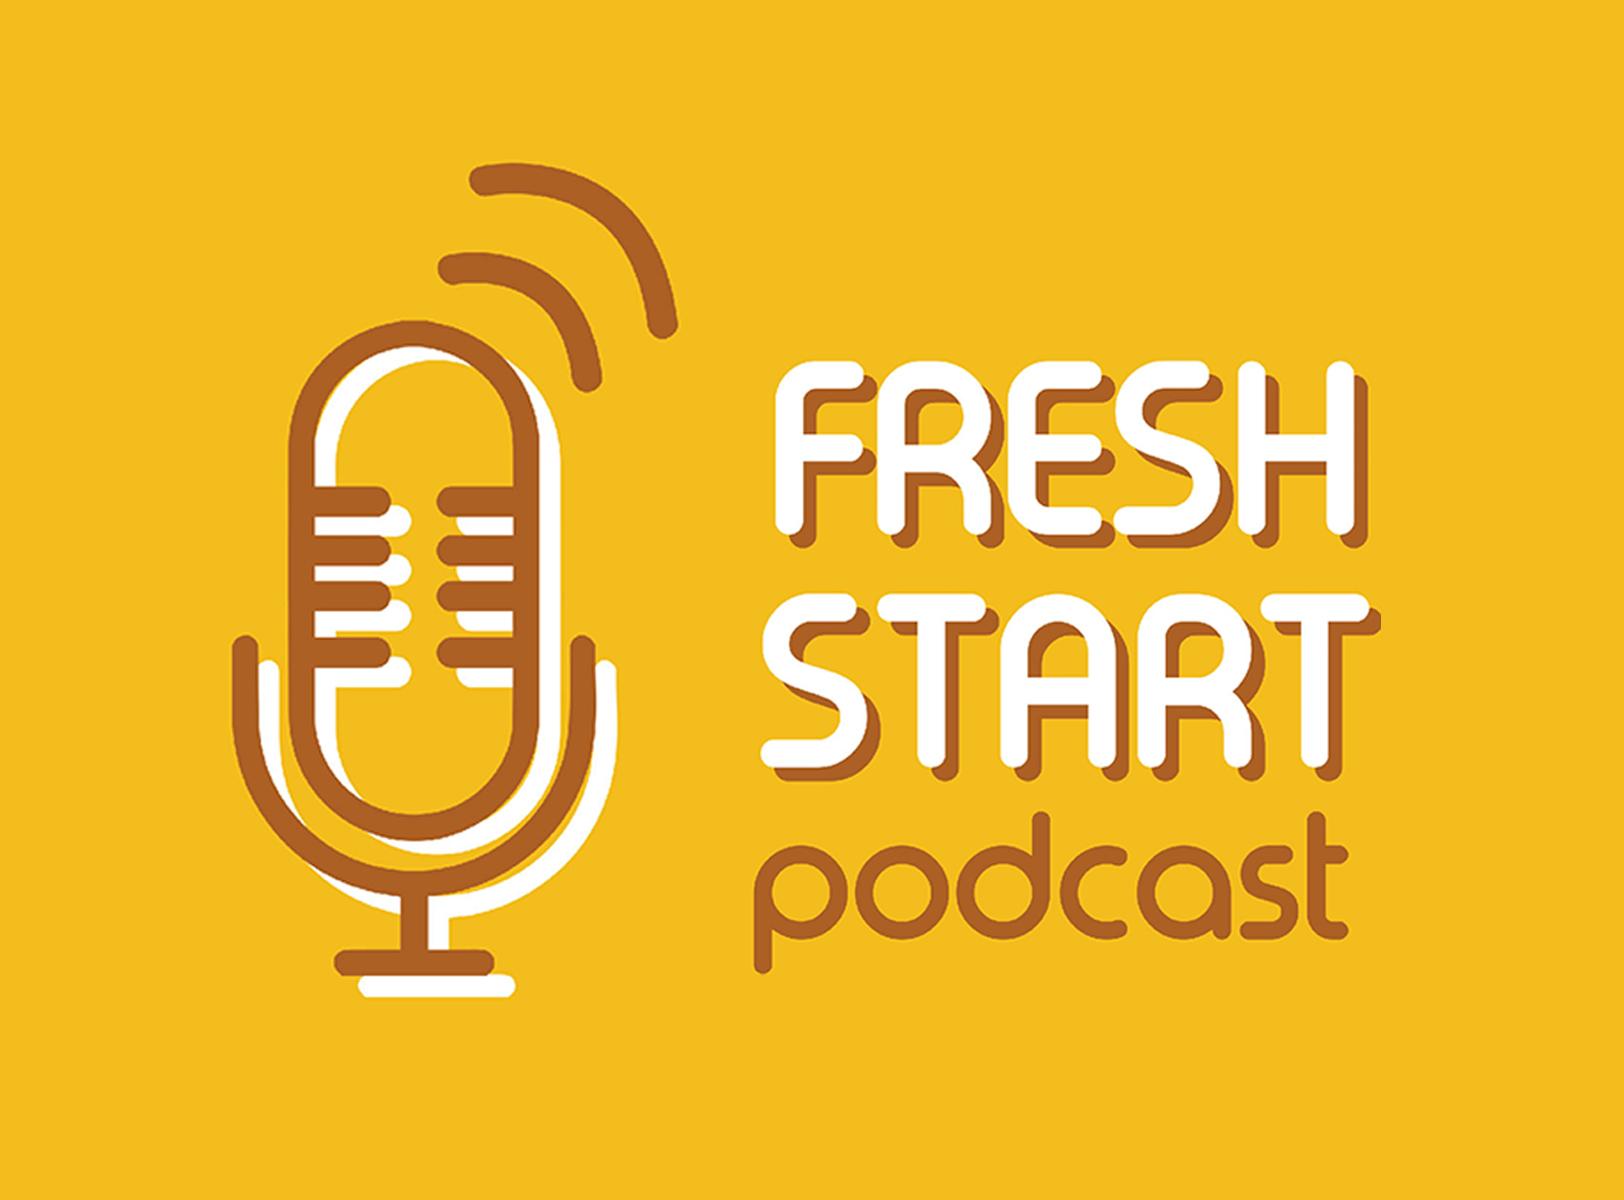 Fresh Start: Podcast News (4/10/2019 Wed.)